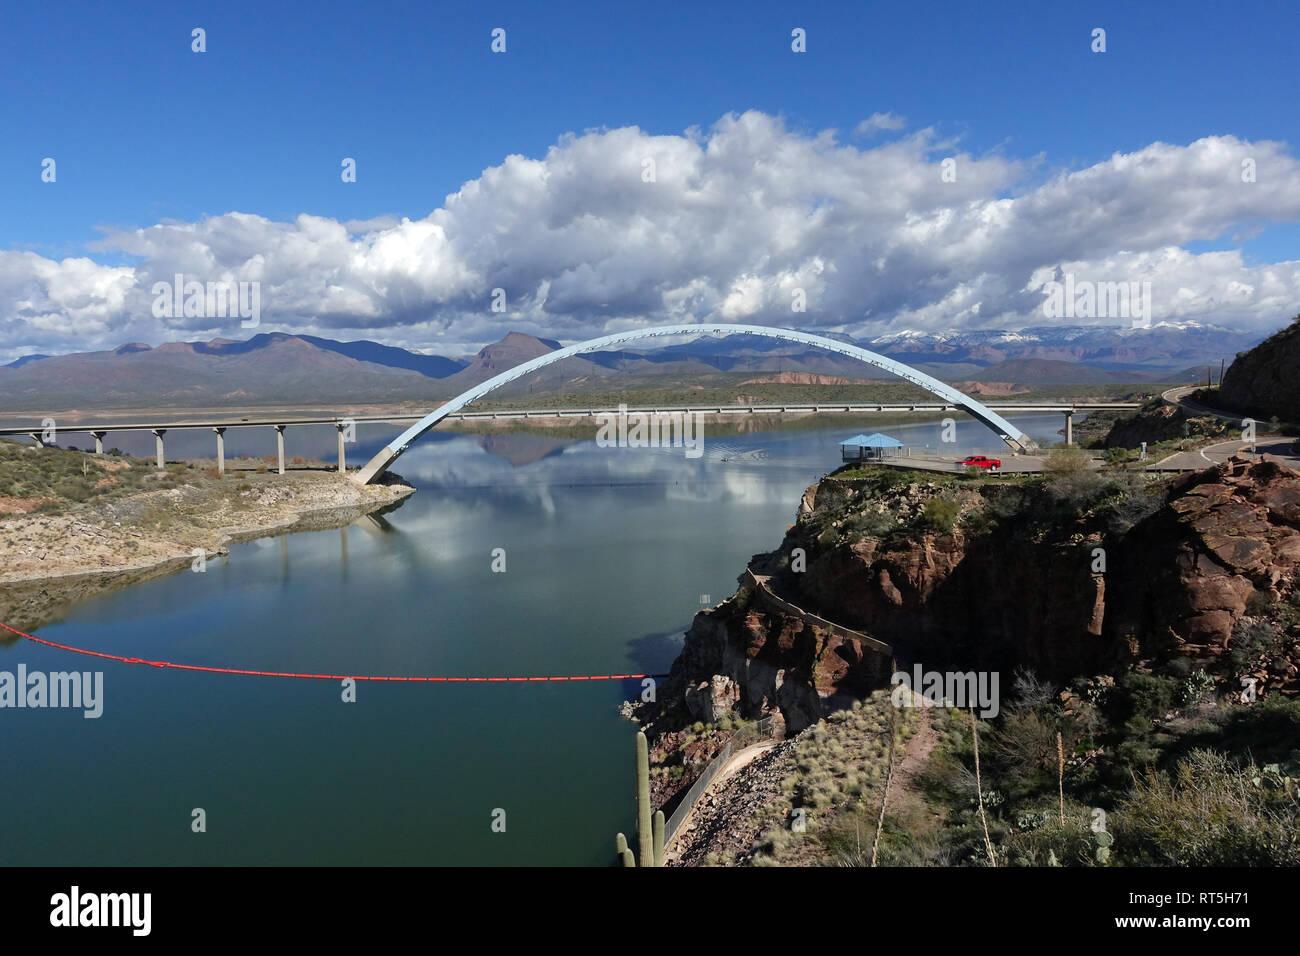 Apache Lake Stock Photos & Apache Lake Stock Images - Alamy